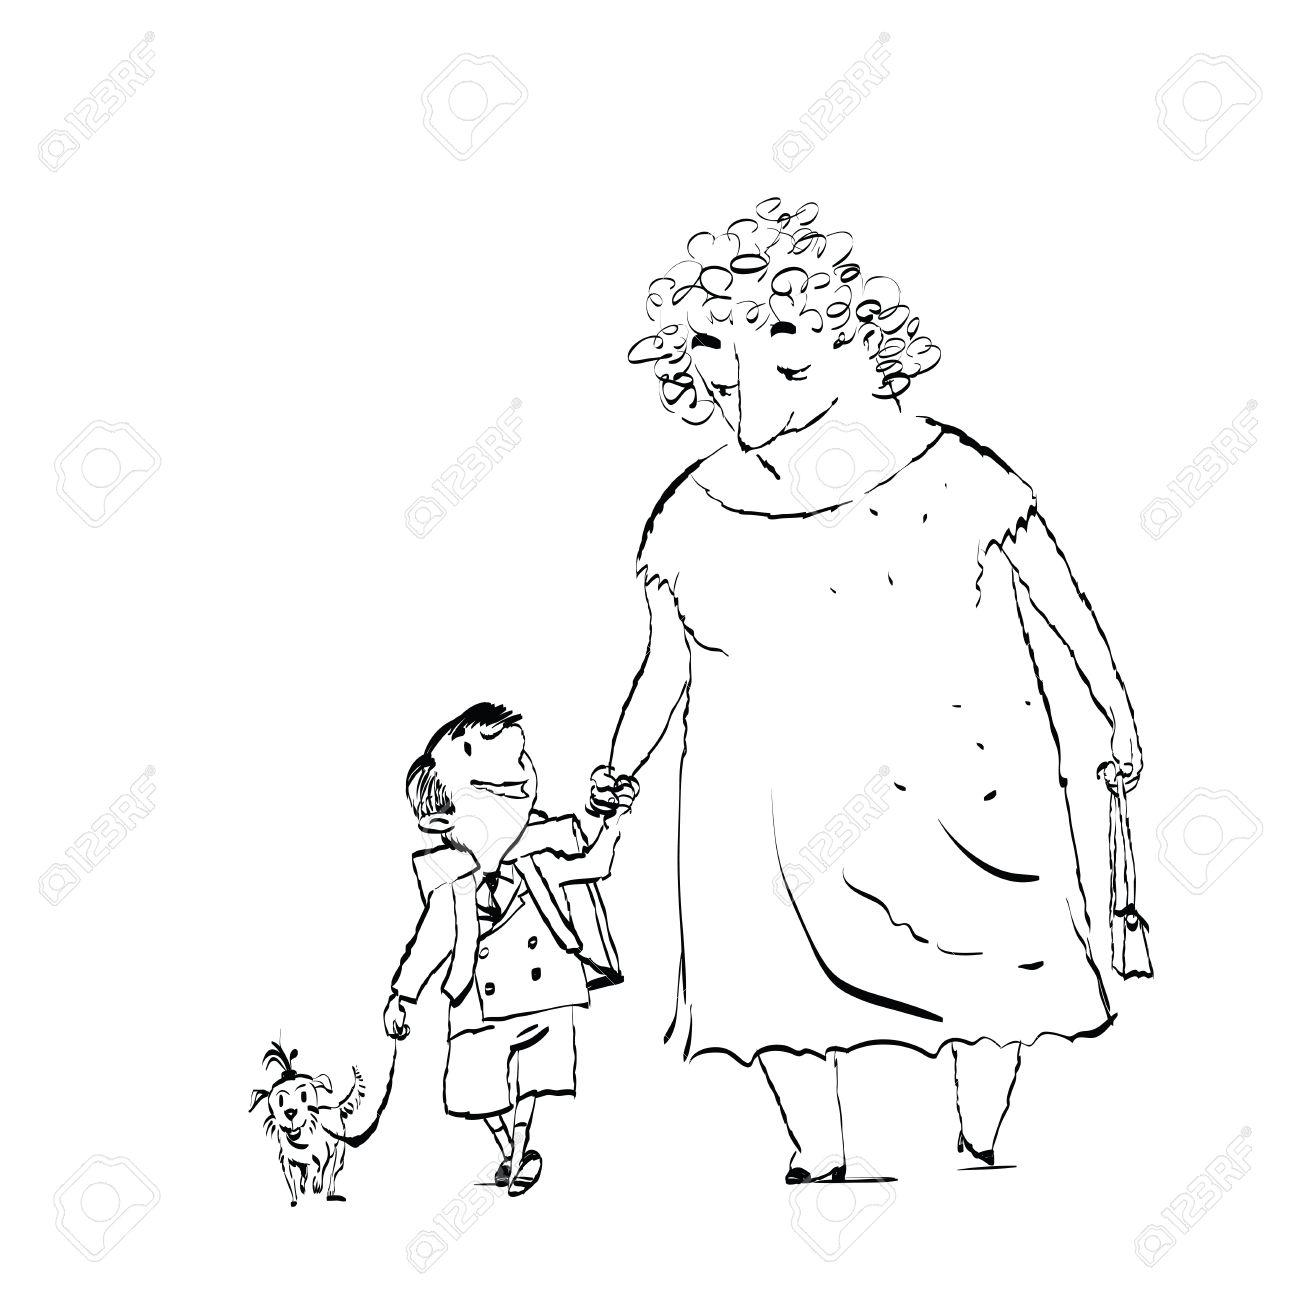 1300x1300 Grandma, Grandson And Dog On A Walk. Black And White Sketch